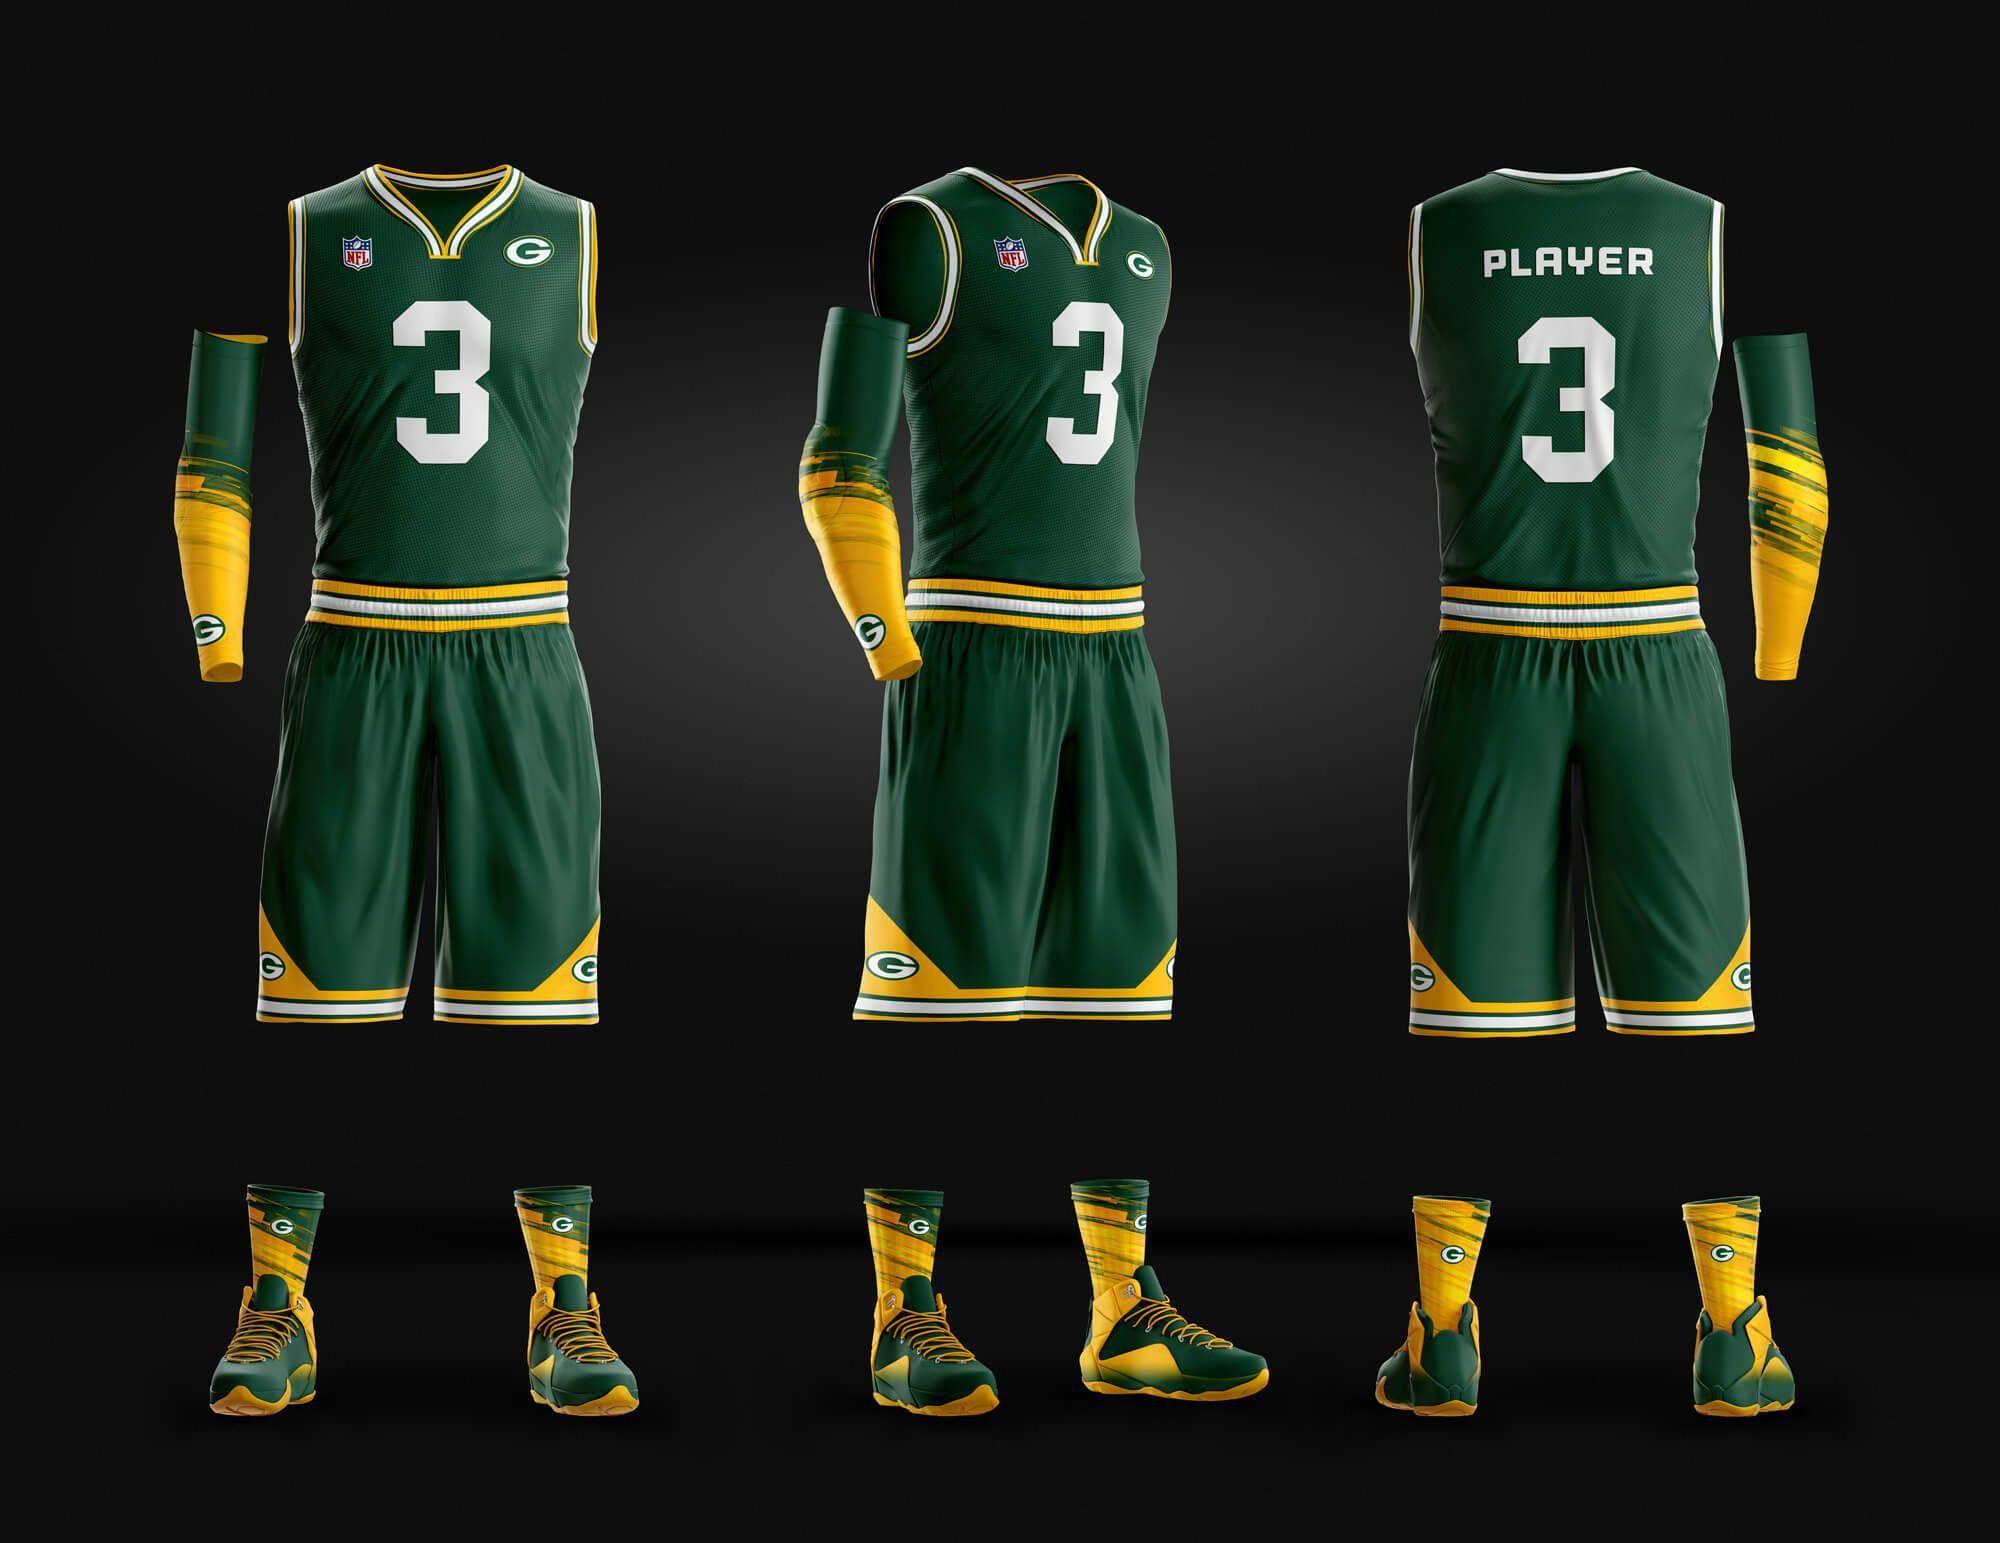 Basketball Photoshop Uniform Psd Template Packers Basketballuniforms Basketball Uniforms Design Basketball Uniforms Basketball T Shirt Designs